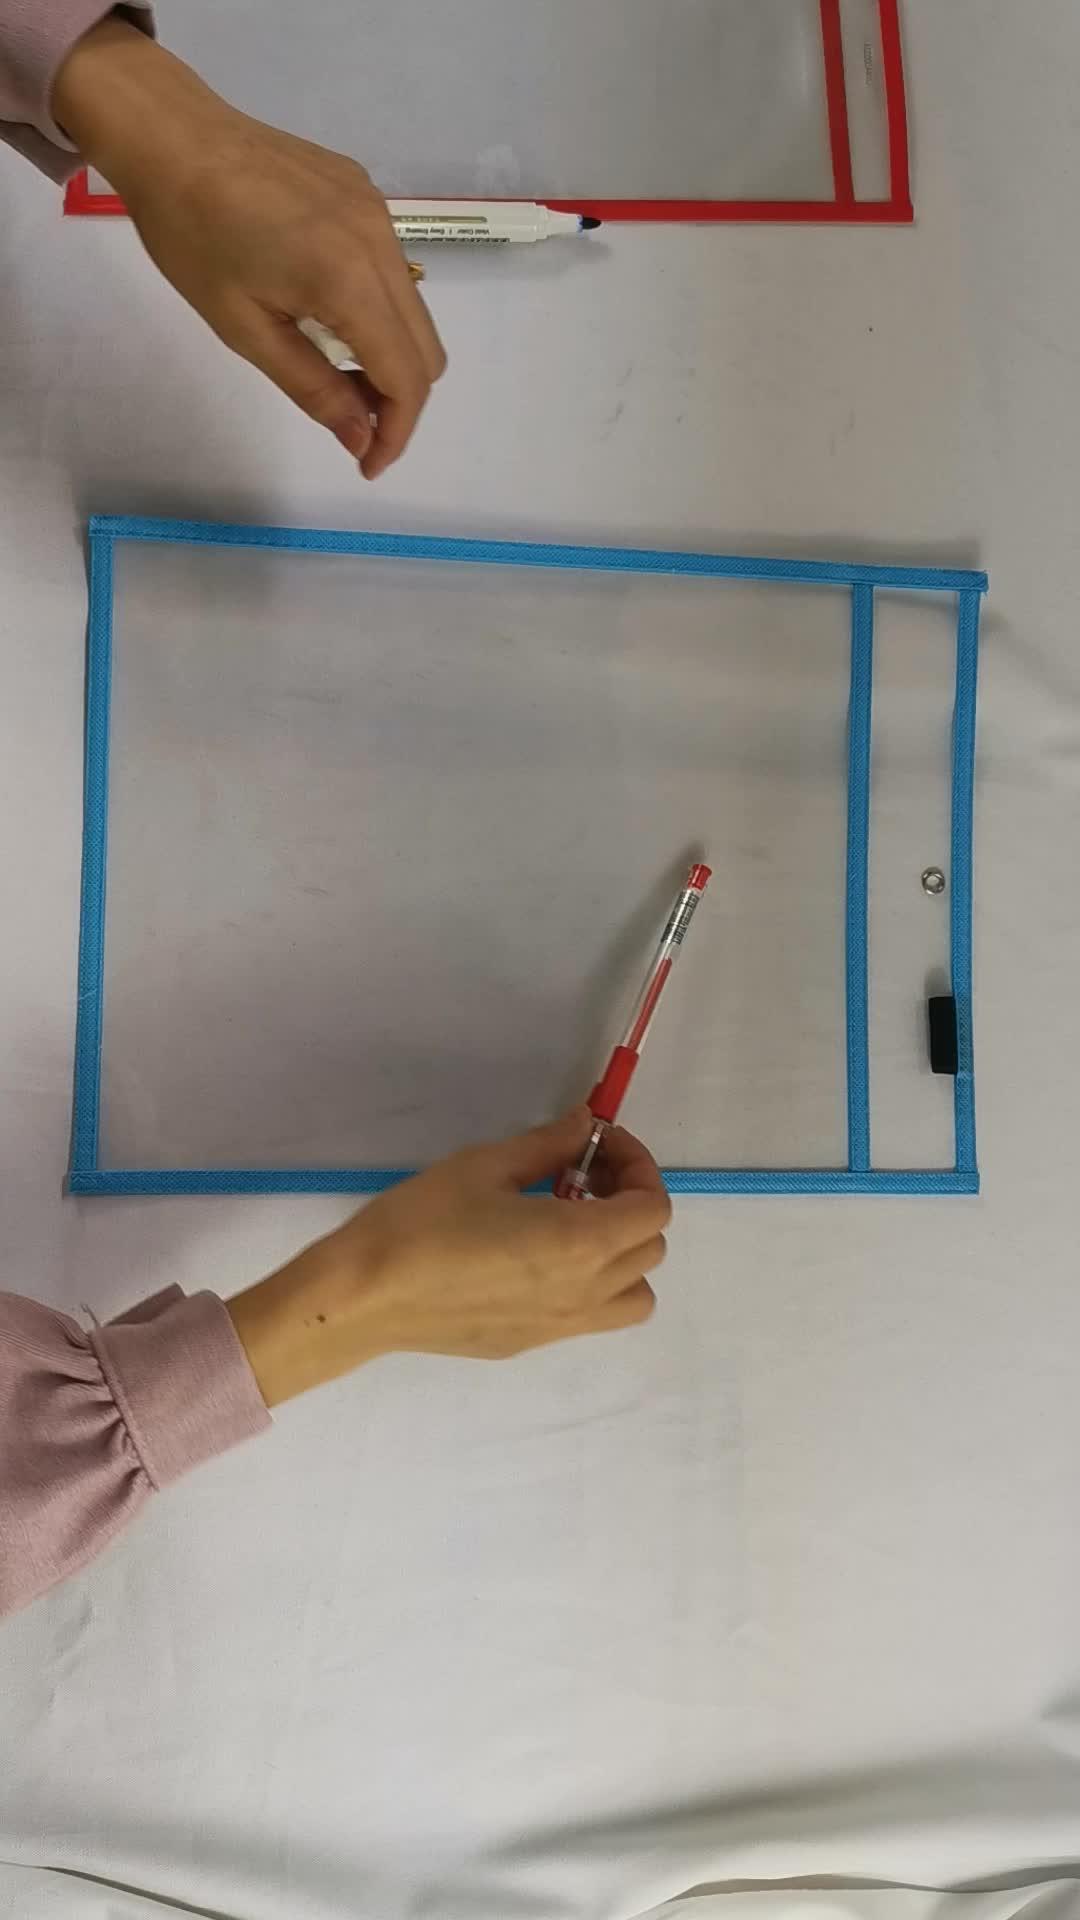 Oversize Classroom Home Clear PVC Transparent Reusable Dry Erase Pockets